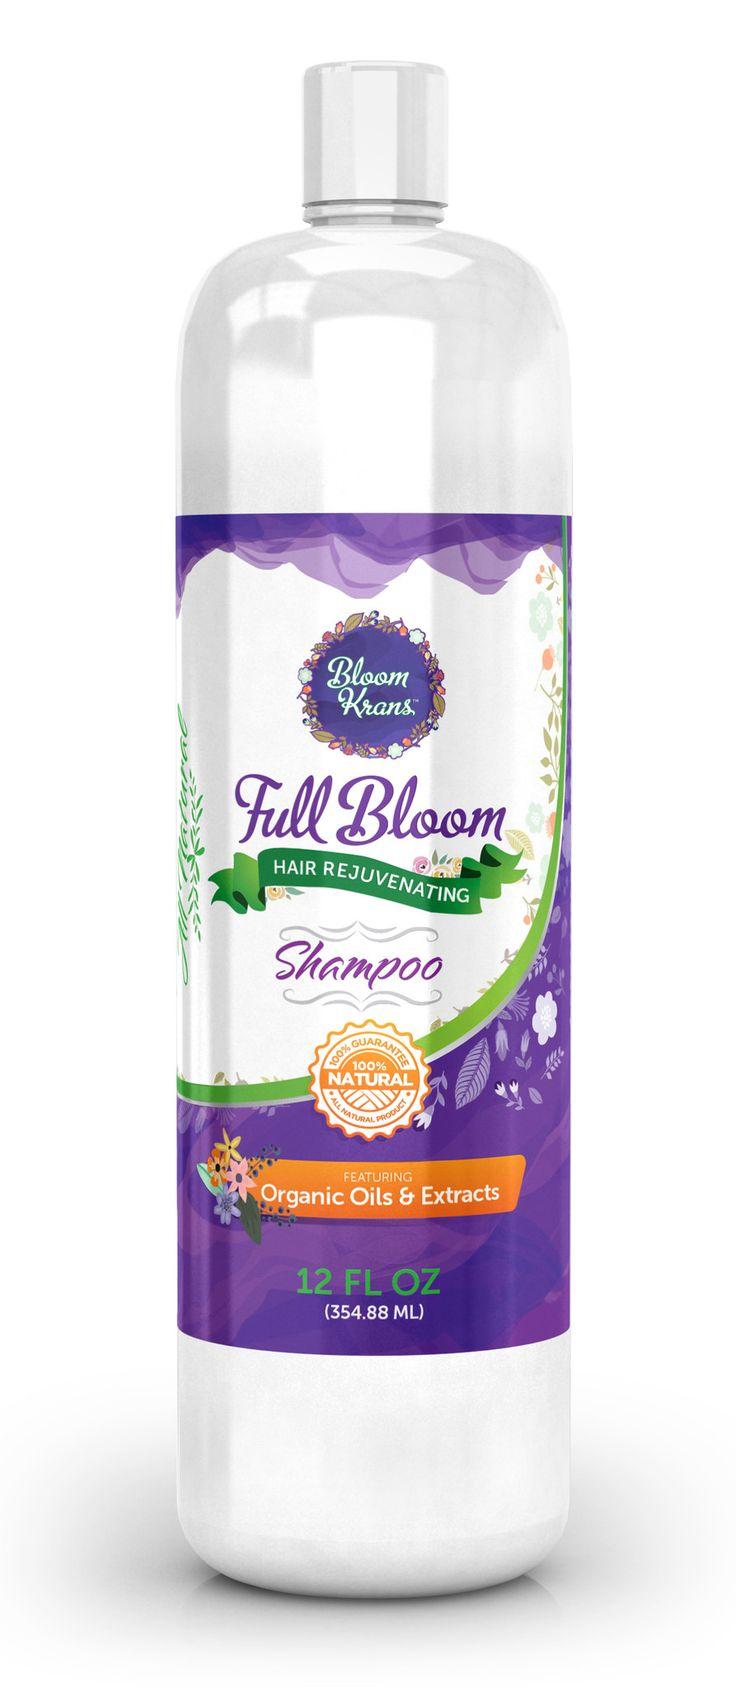 Anti Hair Loss Shampoo - Promotes Hair Growth - Organic & Natural Ing. (Biotin, Apple Stem Cells, Keratin, Saw Palmetto DHT Blocker) - Natural Shampoo -SLS Free Shampoo & Sulfate Free